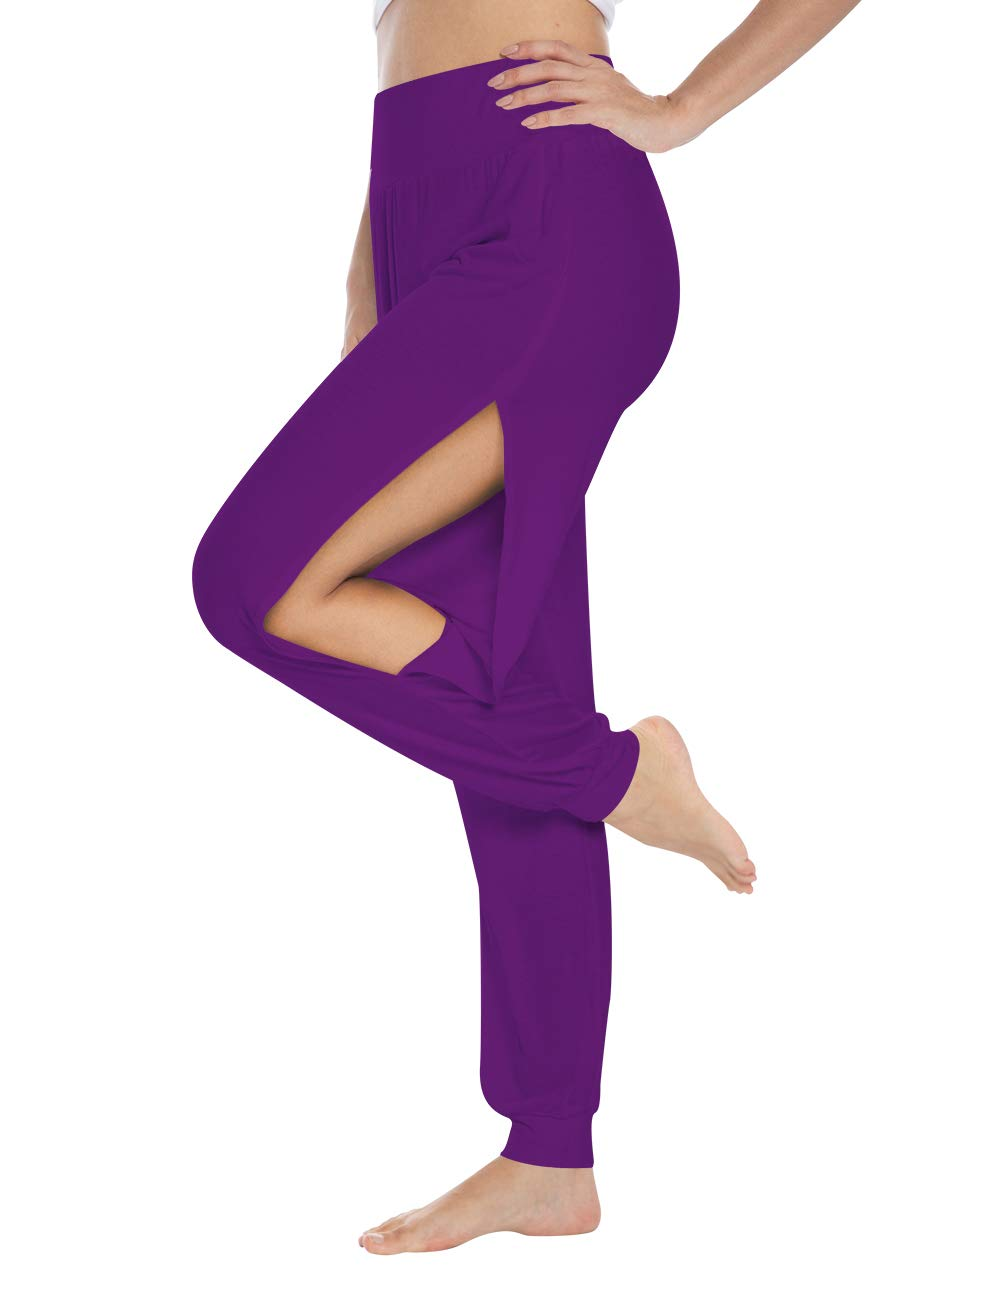 fitglam Women's Harem Yoga Pants Side Slit Lounge Workout Beach Jogger Pant